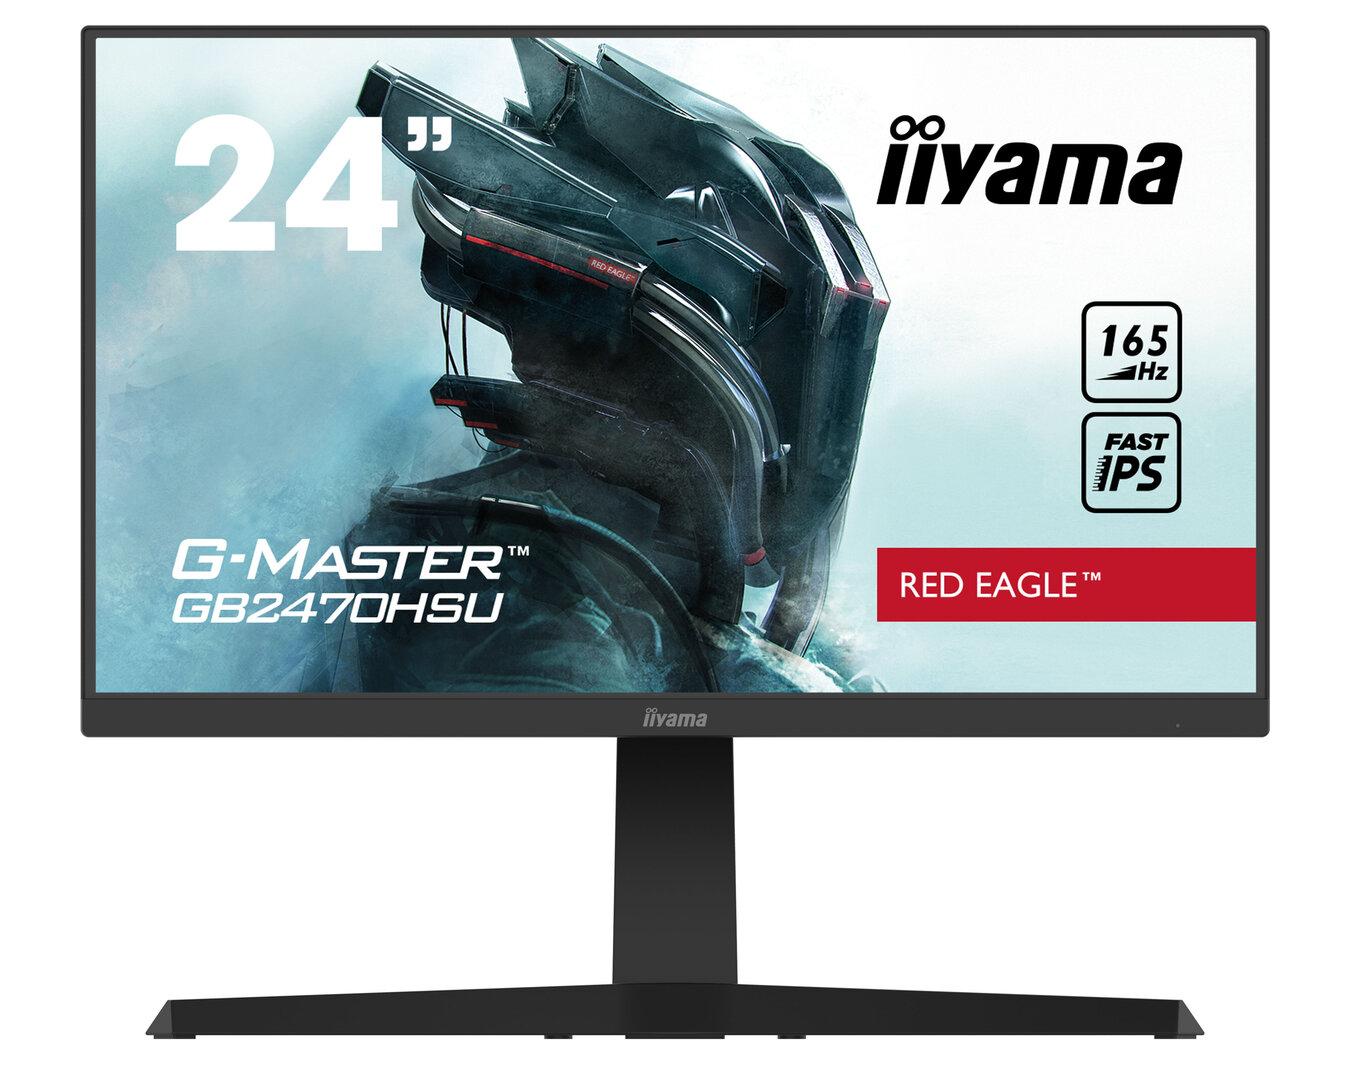 iiyama G-Master GB2470HSU Roter Adler